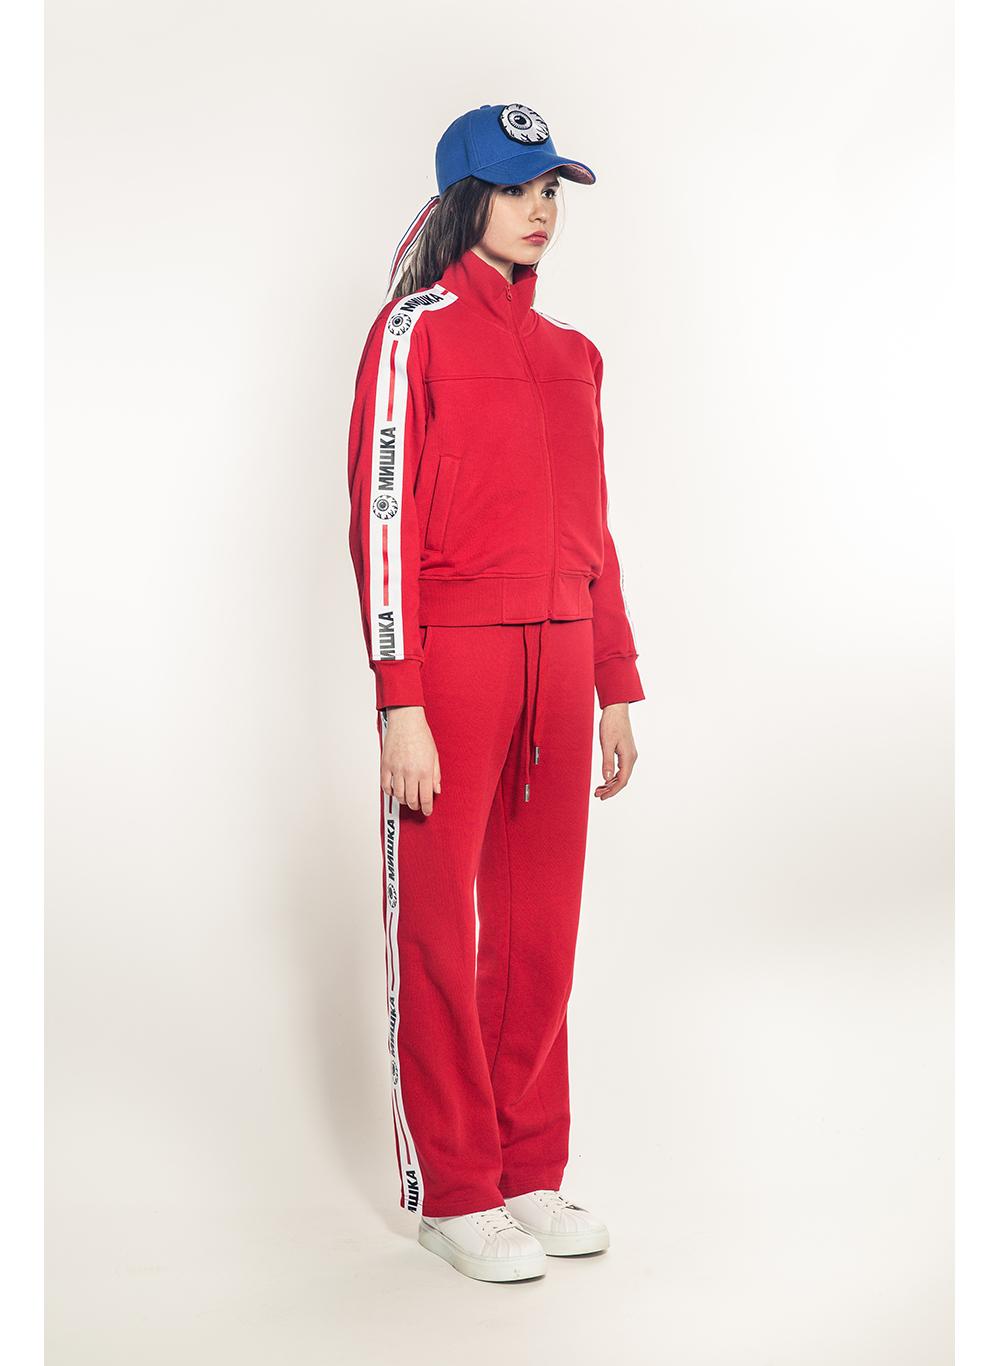 Cyrillic Keep Watch Stripe Women's Jacket